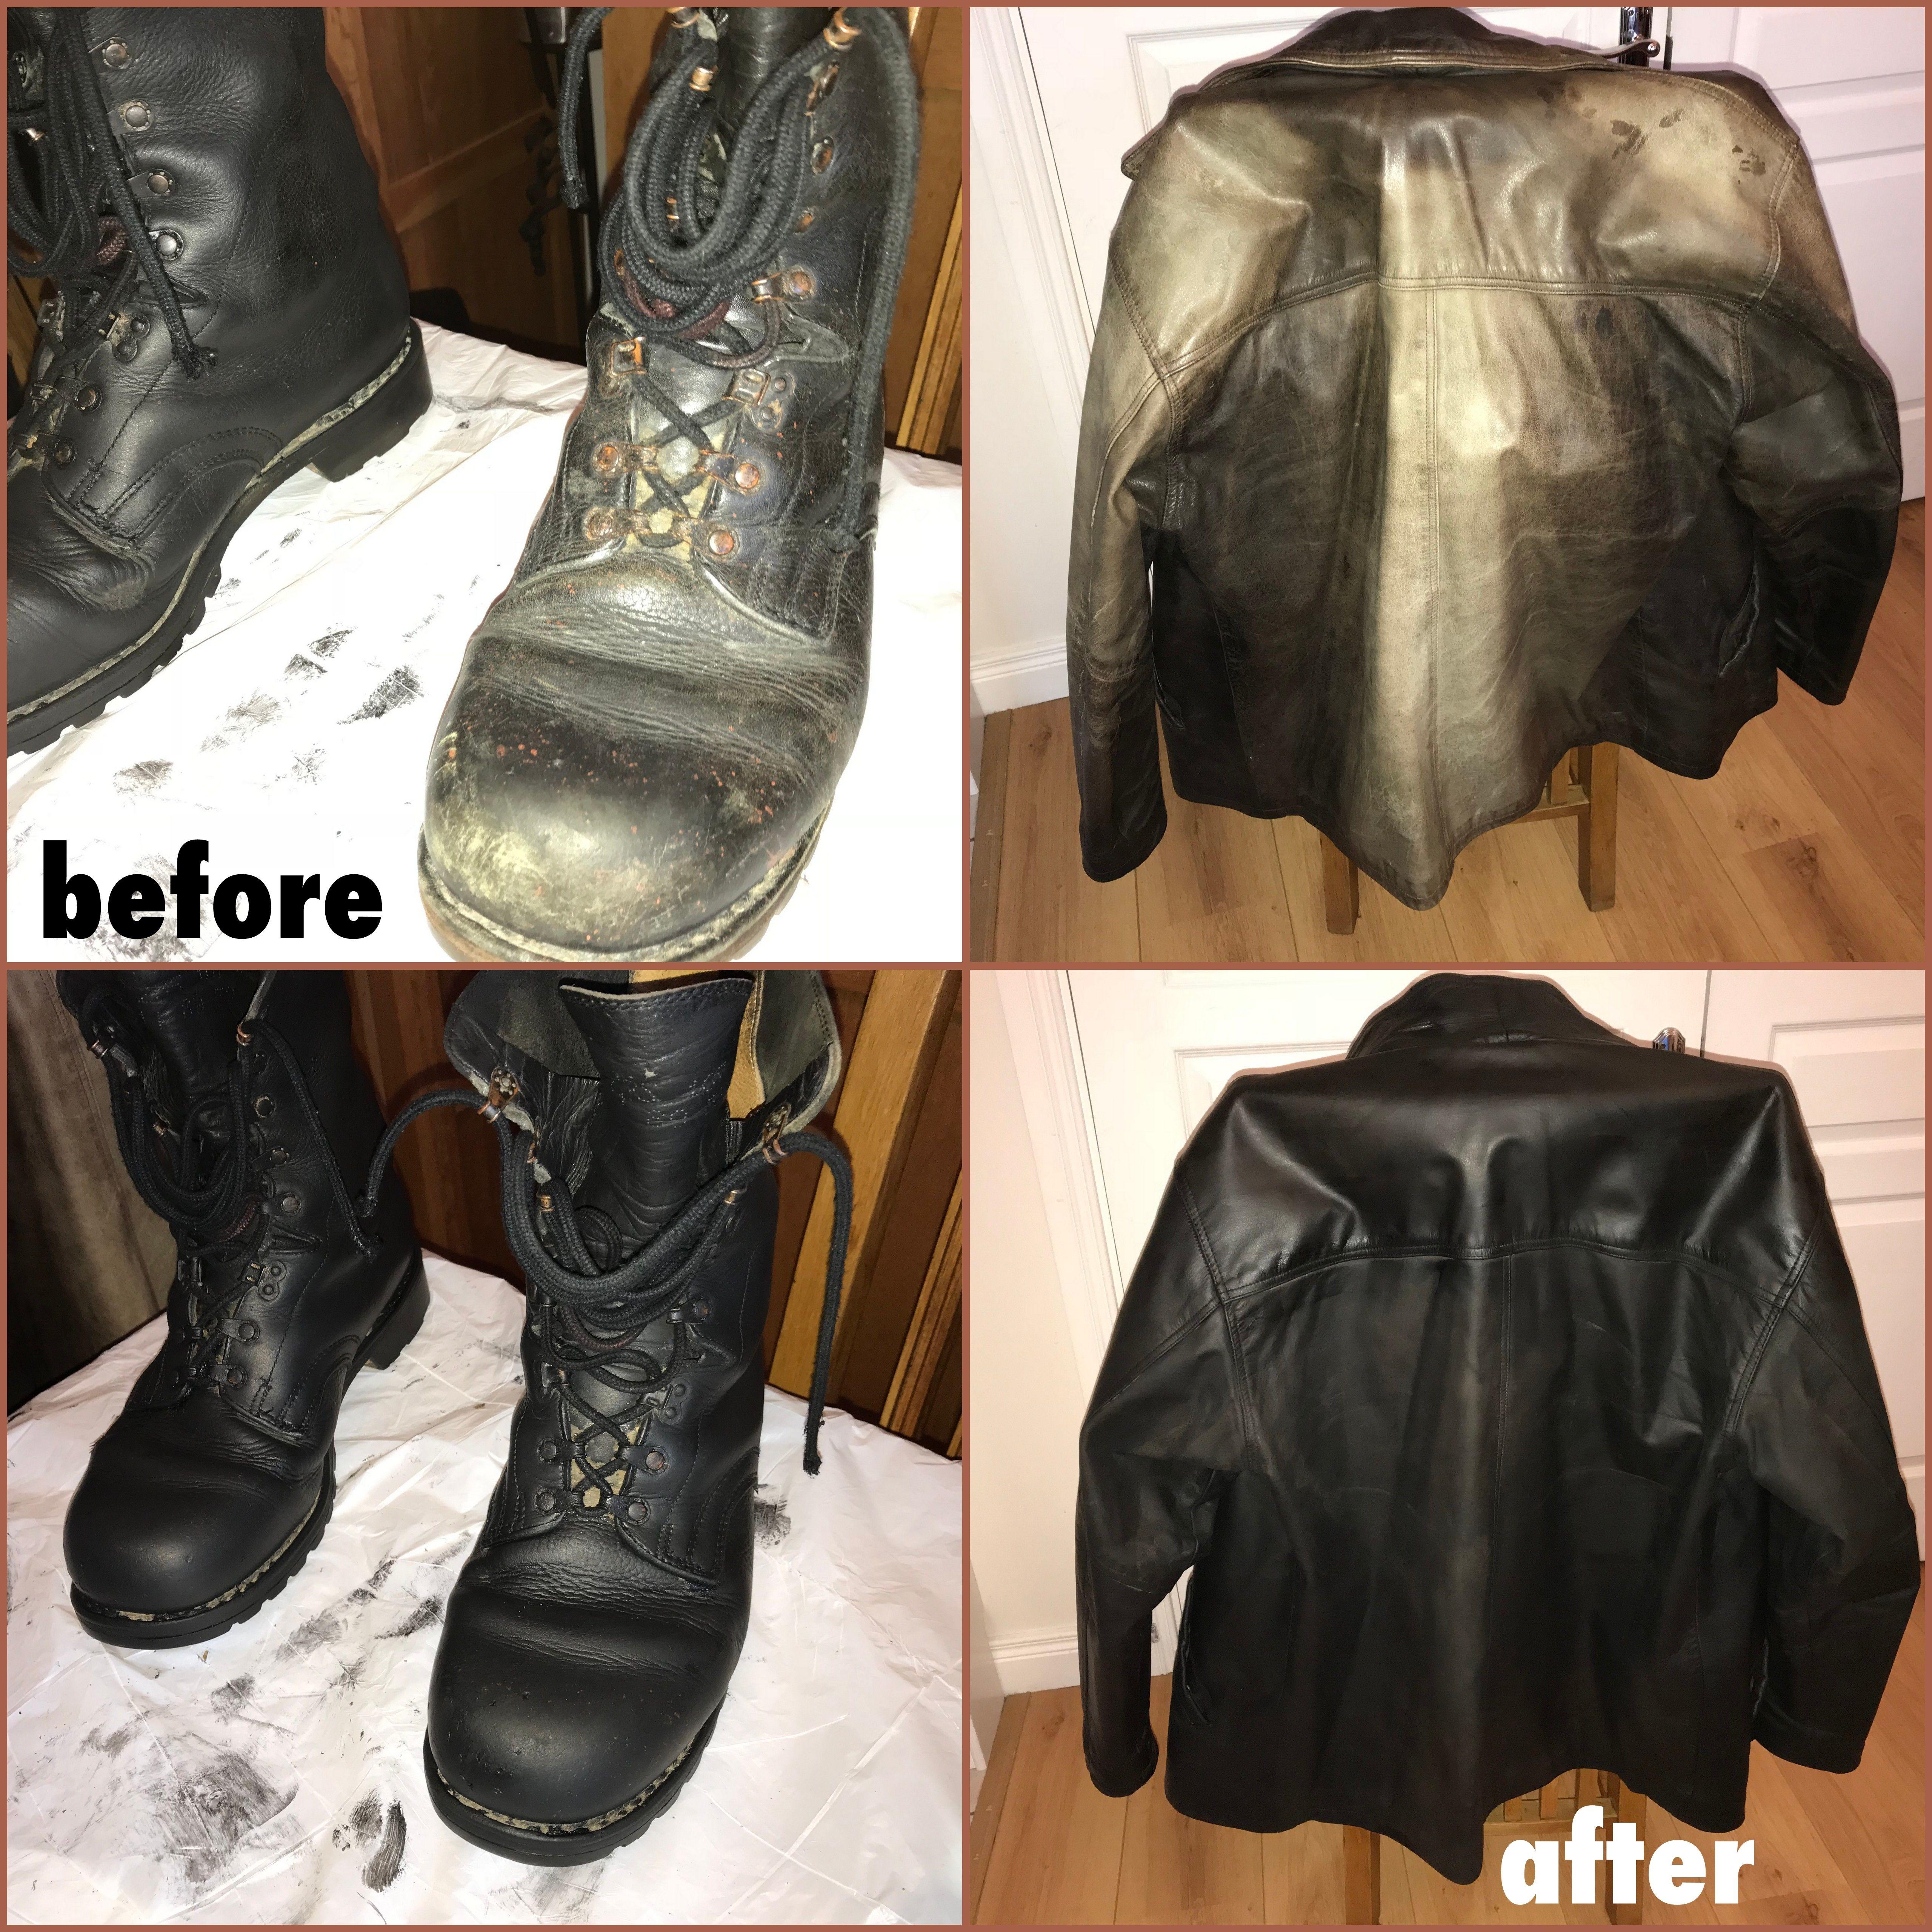 Black Leather Car Seat Paint Vinyl Car Seat Dye Restore Refinish Leather Restoration Leather Dye Black Vinyl